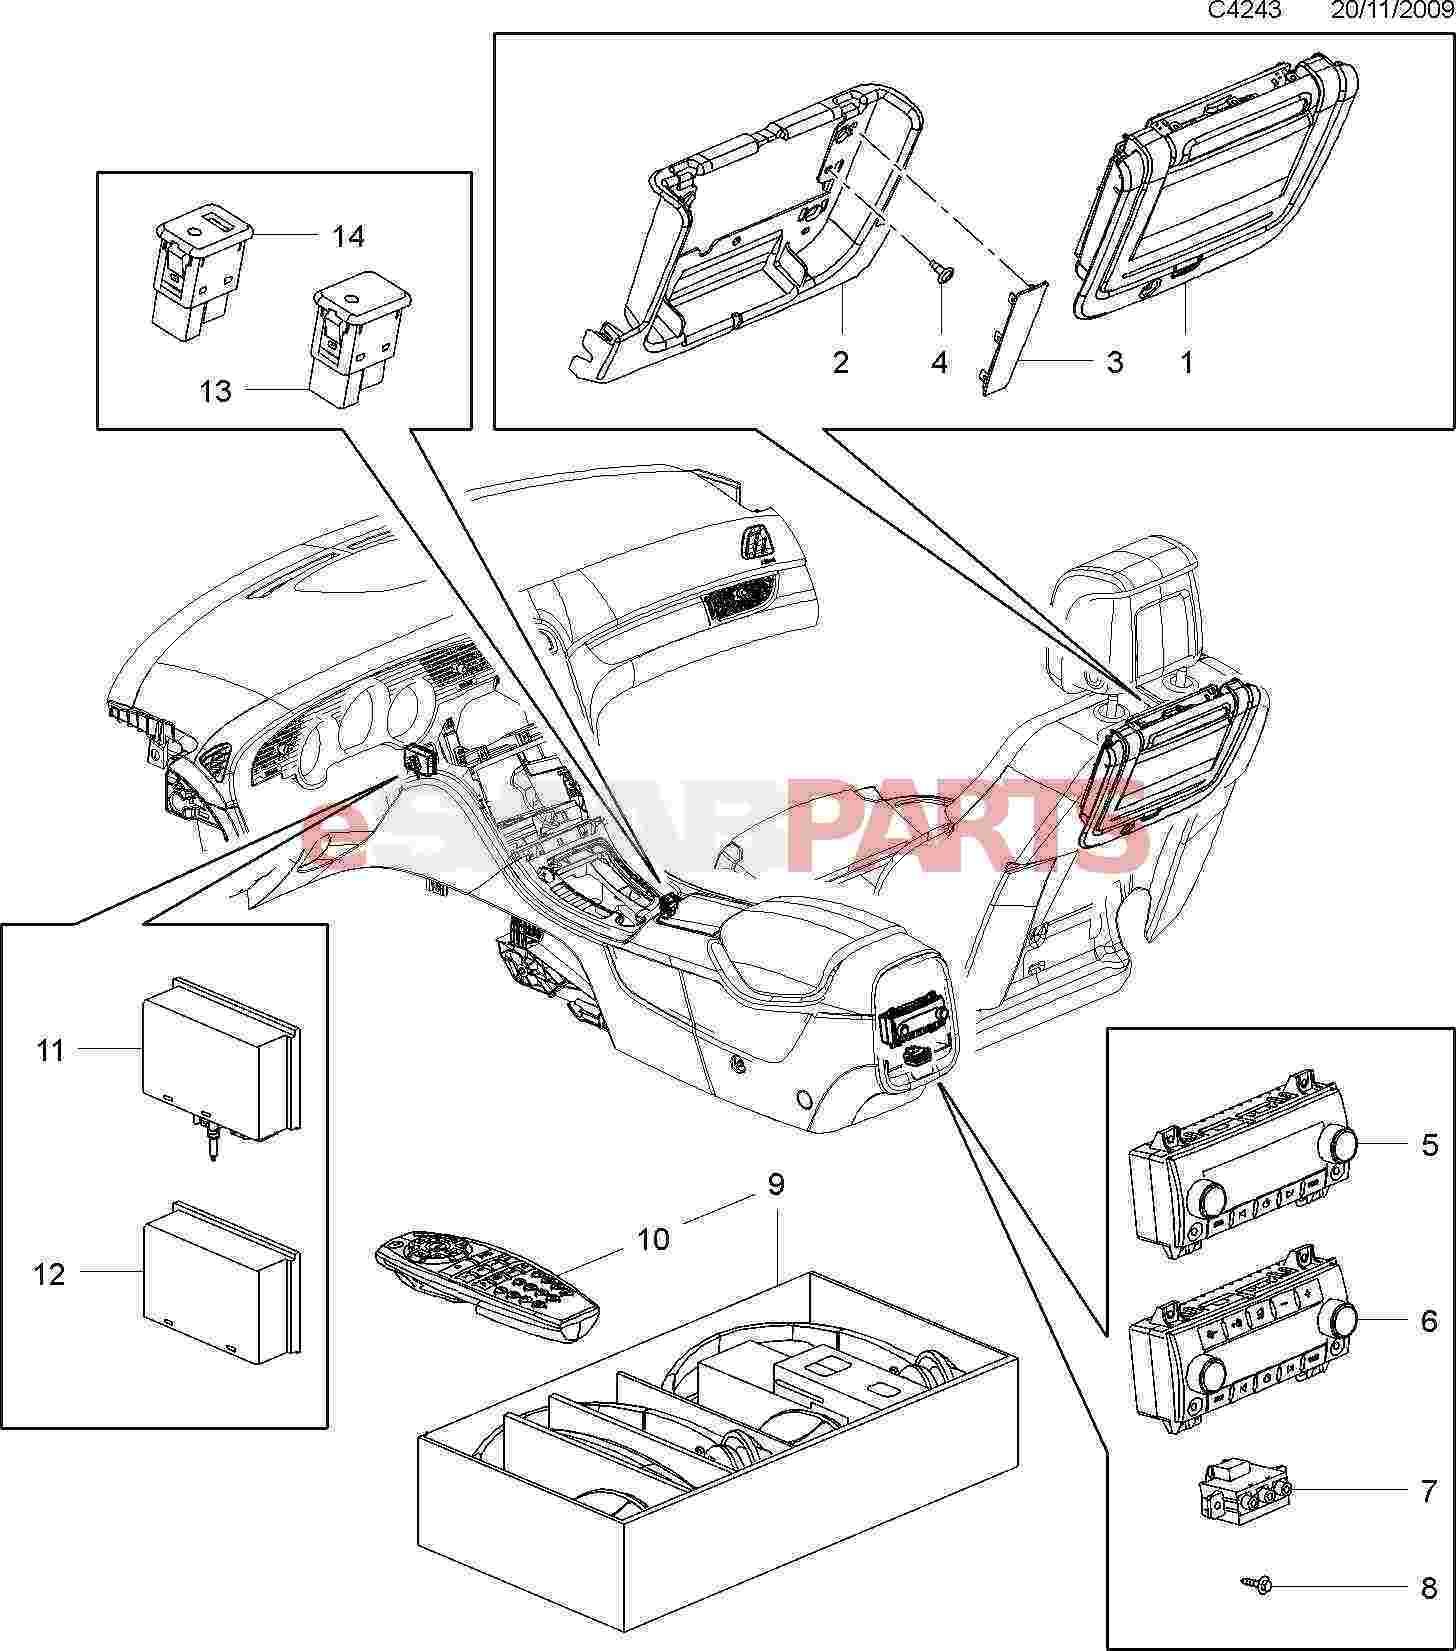 esaabparts com saab 9 5 (650) \u003e electrical parts \u003e audio \u0026 relatedesaabparts com saab 9 5 (650) \u003e electrical parts \u003e audio \u0026 related \u003e rear seat entertainment package